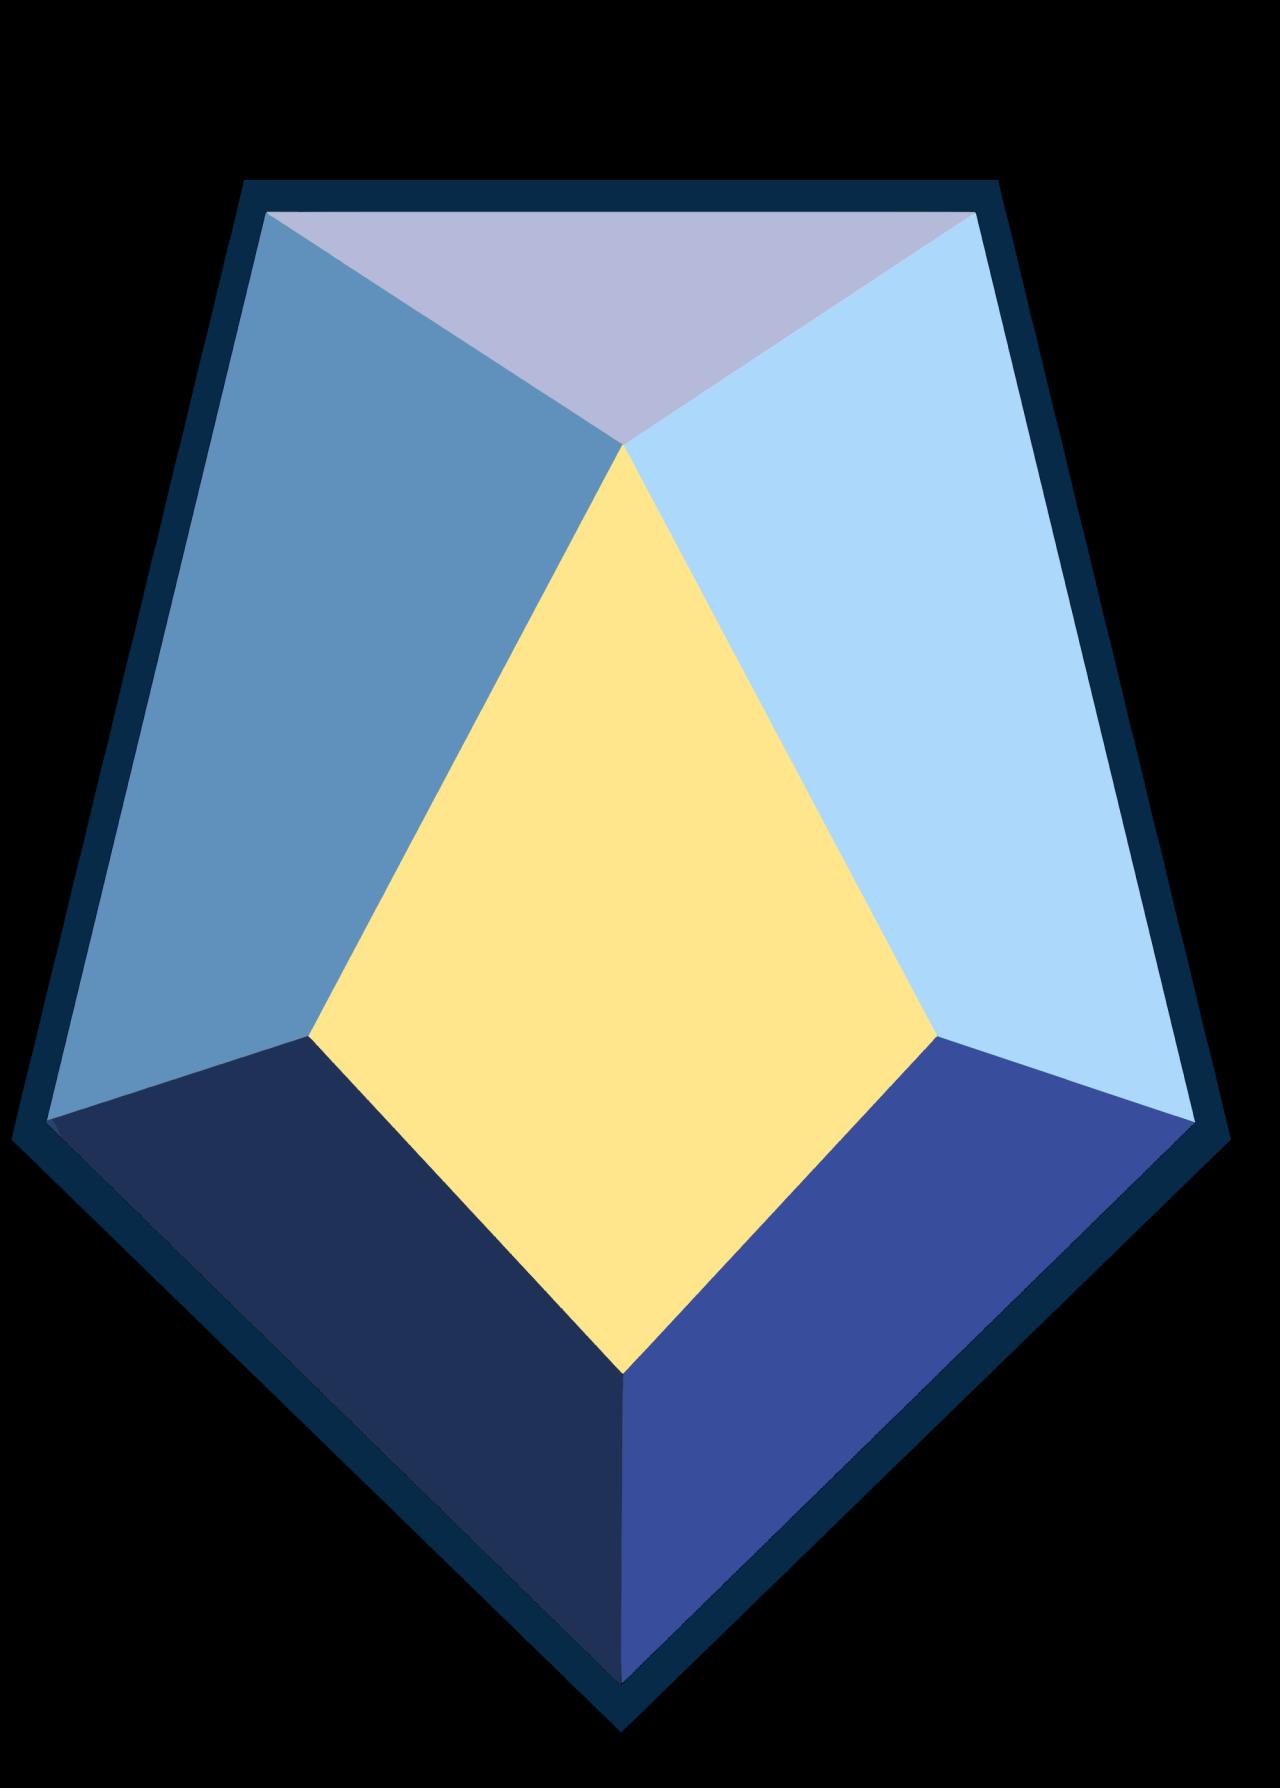 Polyhedroid